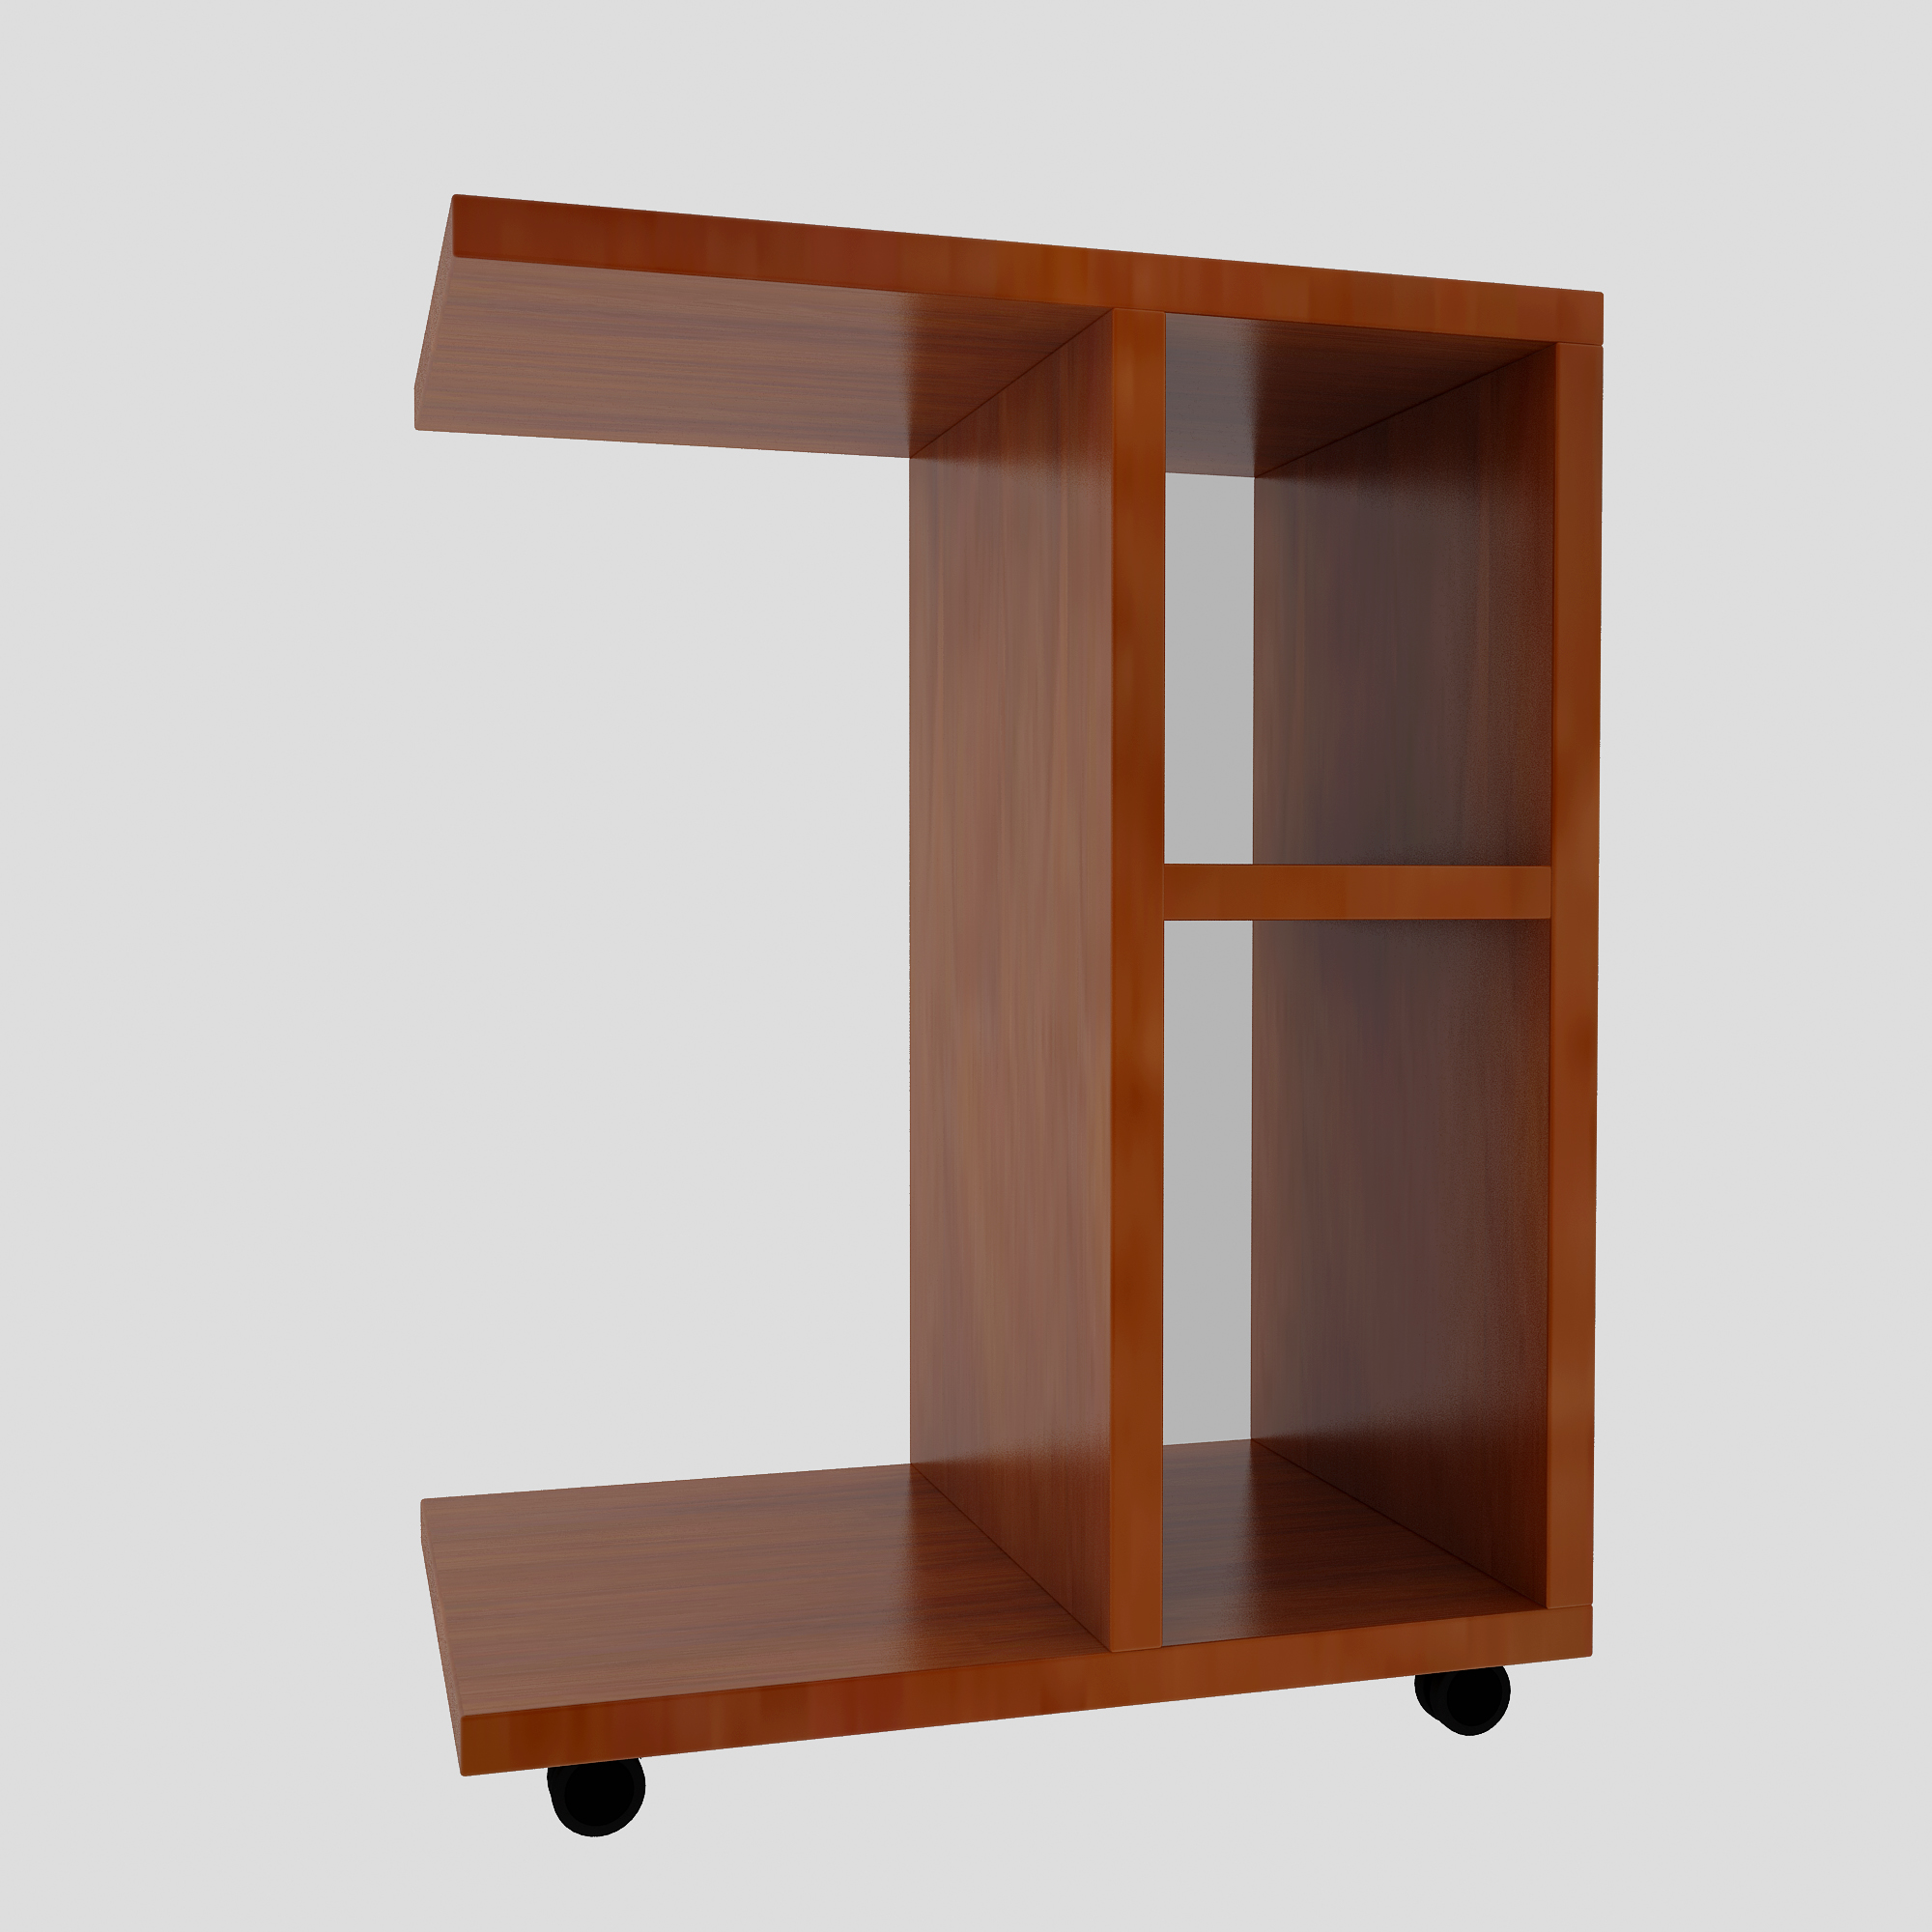 2B Modern Living Room Sofa Corner Coffee Table Imitation Wood Side Cabinets Bedside Coffee Table